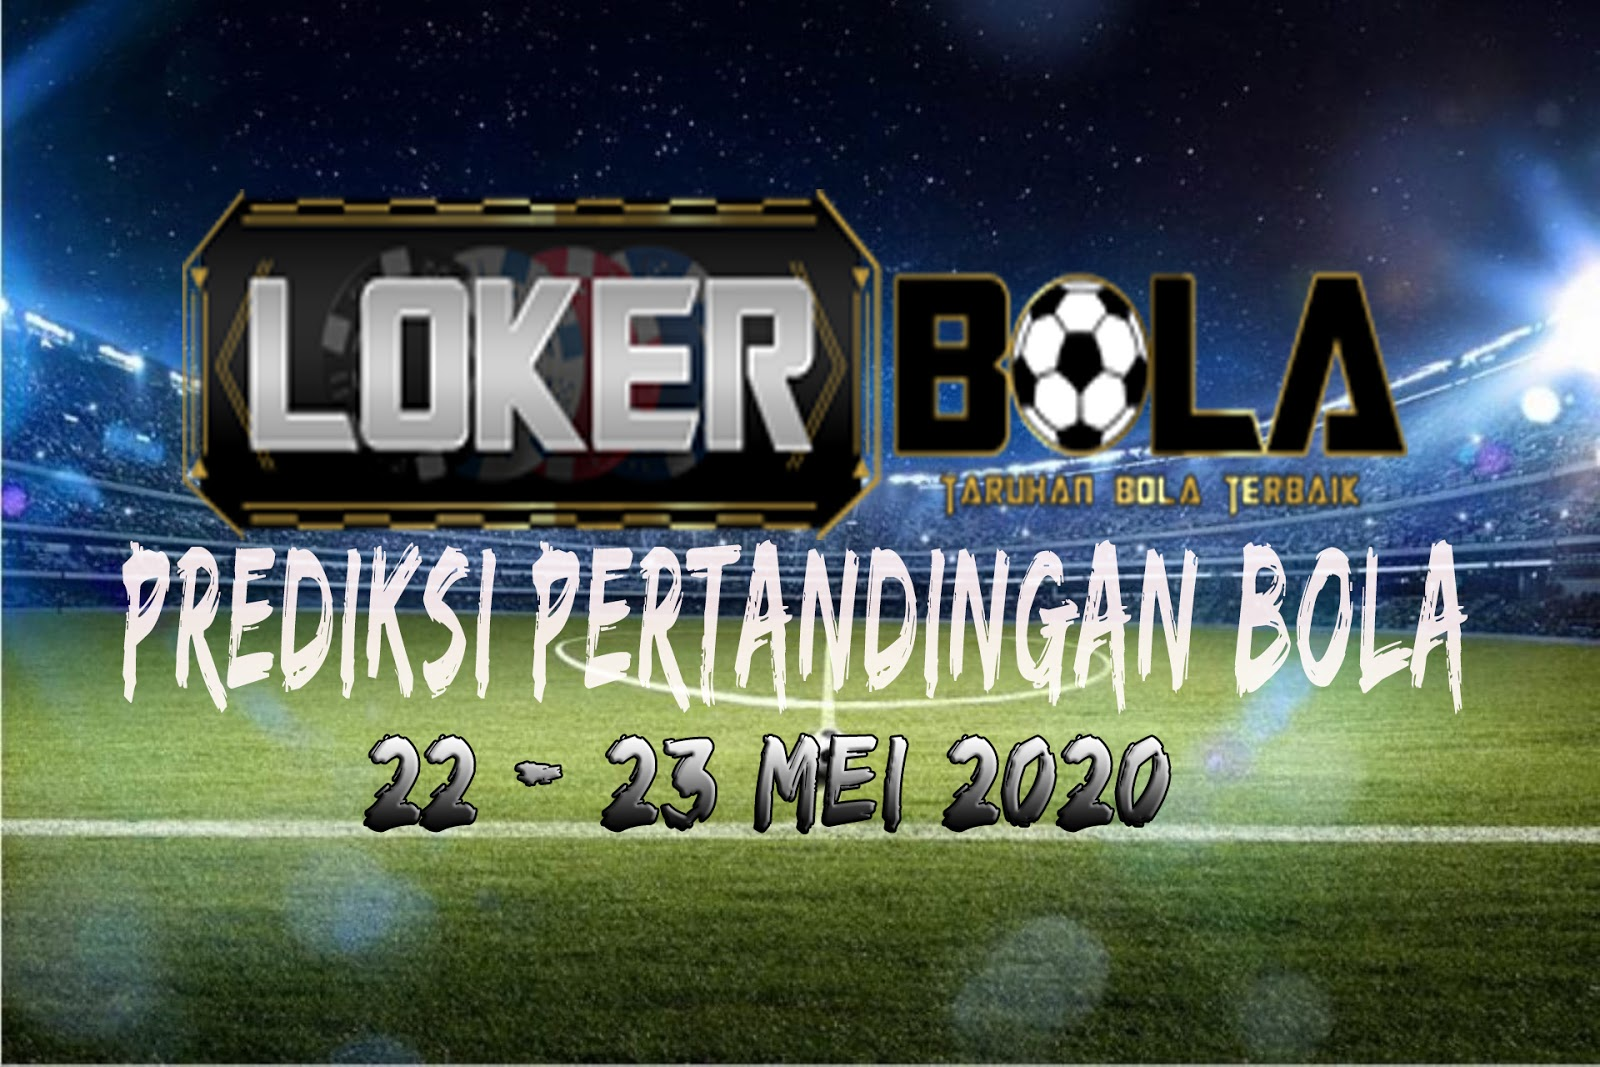 PREDIKSI PERTANDINGAN BOLA 22 – 23  May 2020